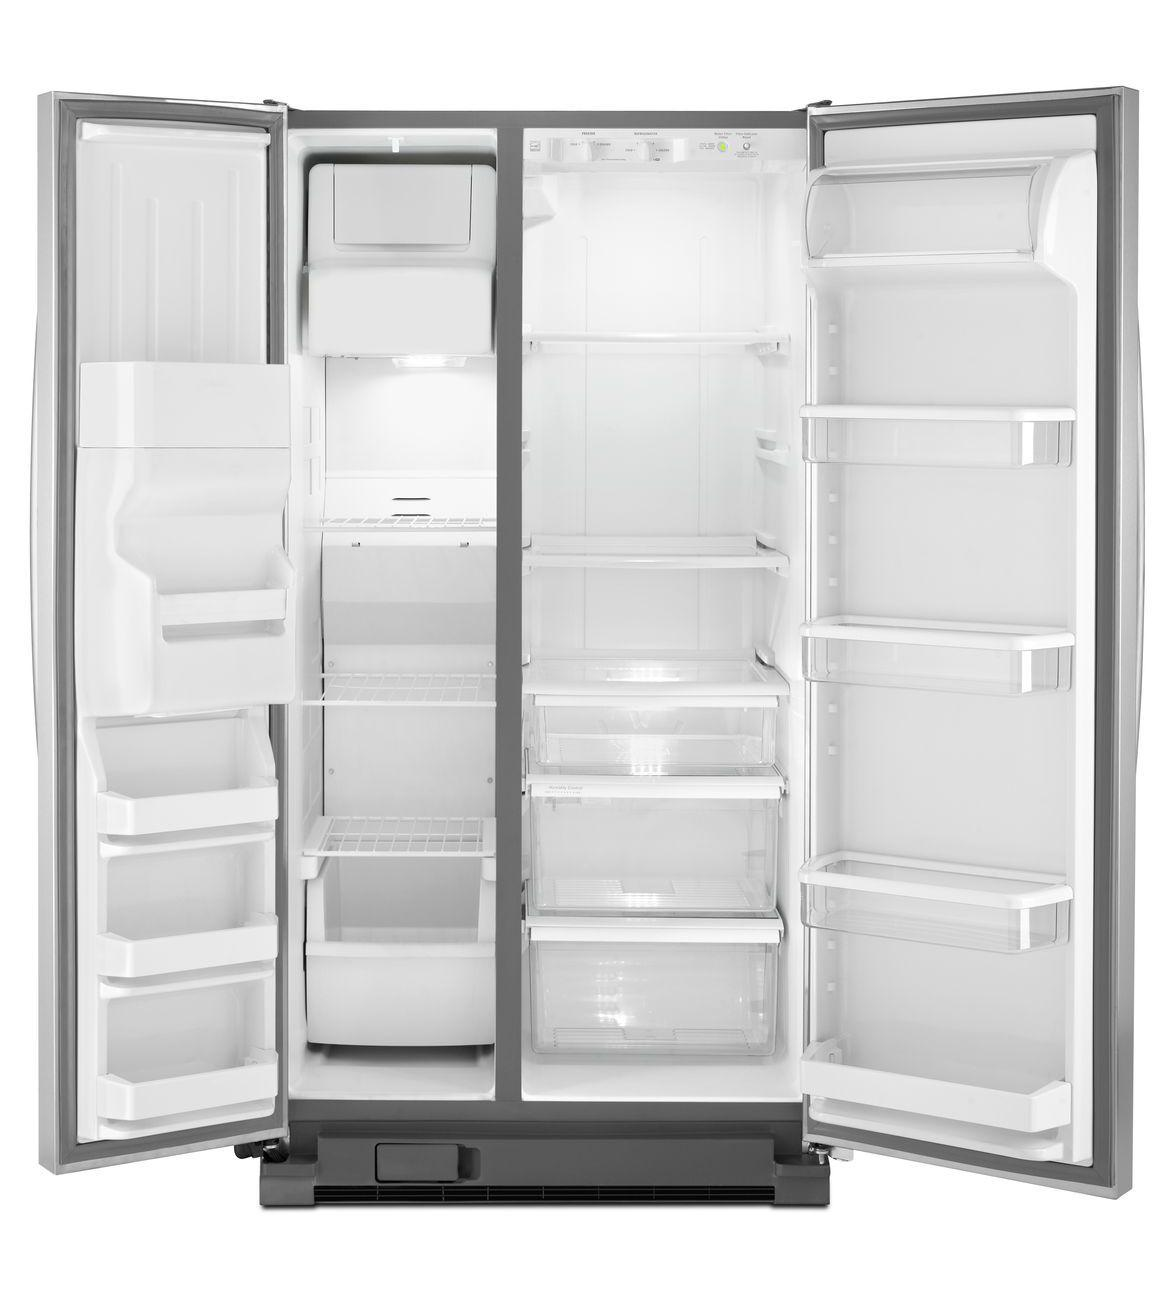 Wrs325fda Whirlpool Wrs325fda Side By Side Refrigerators